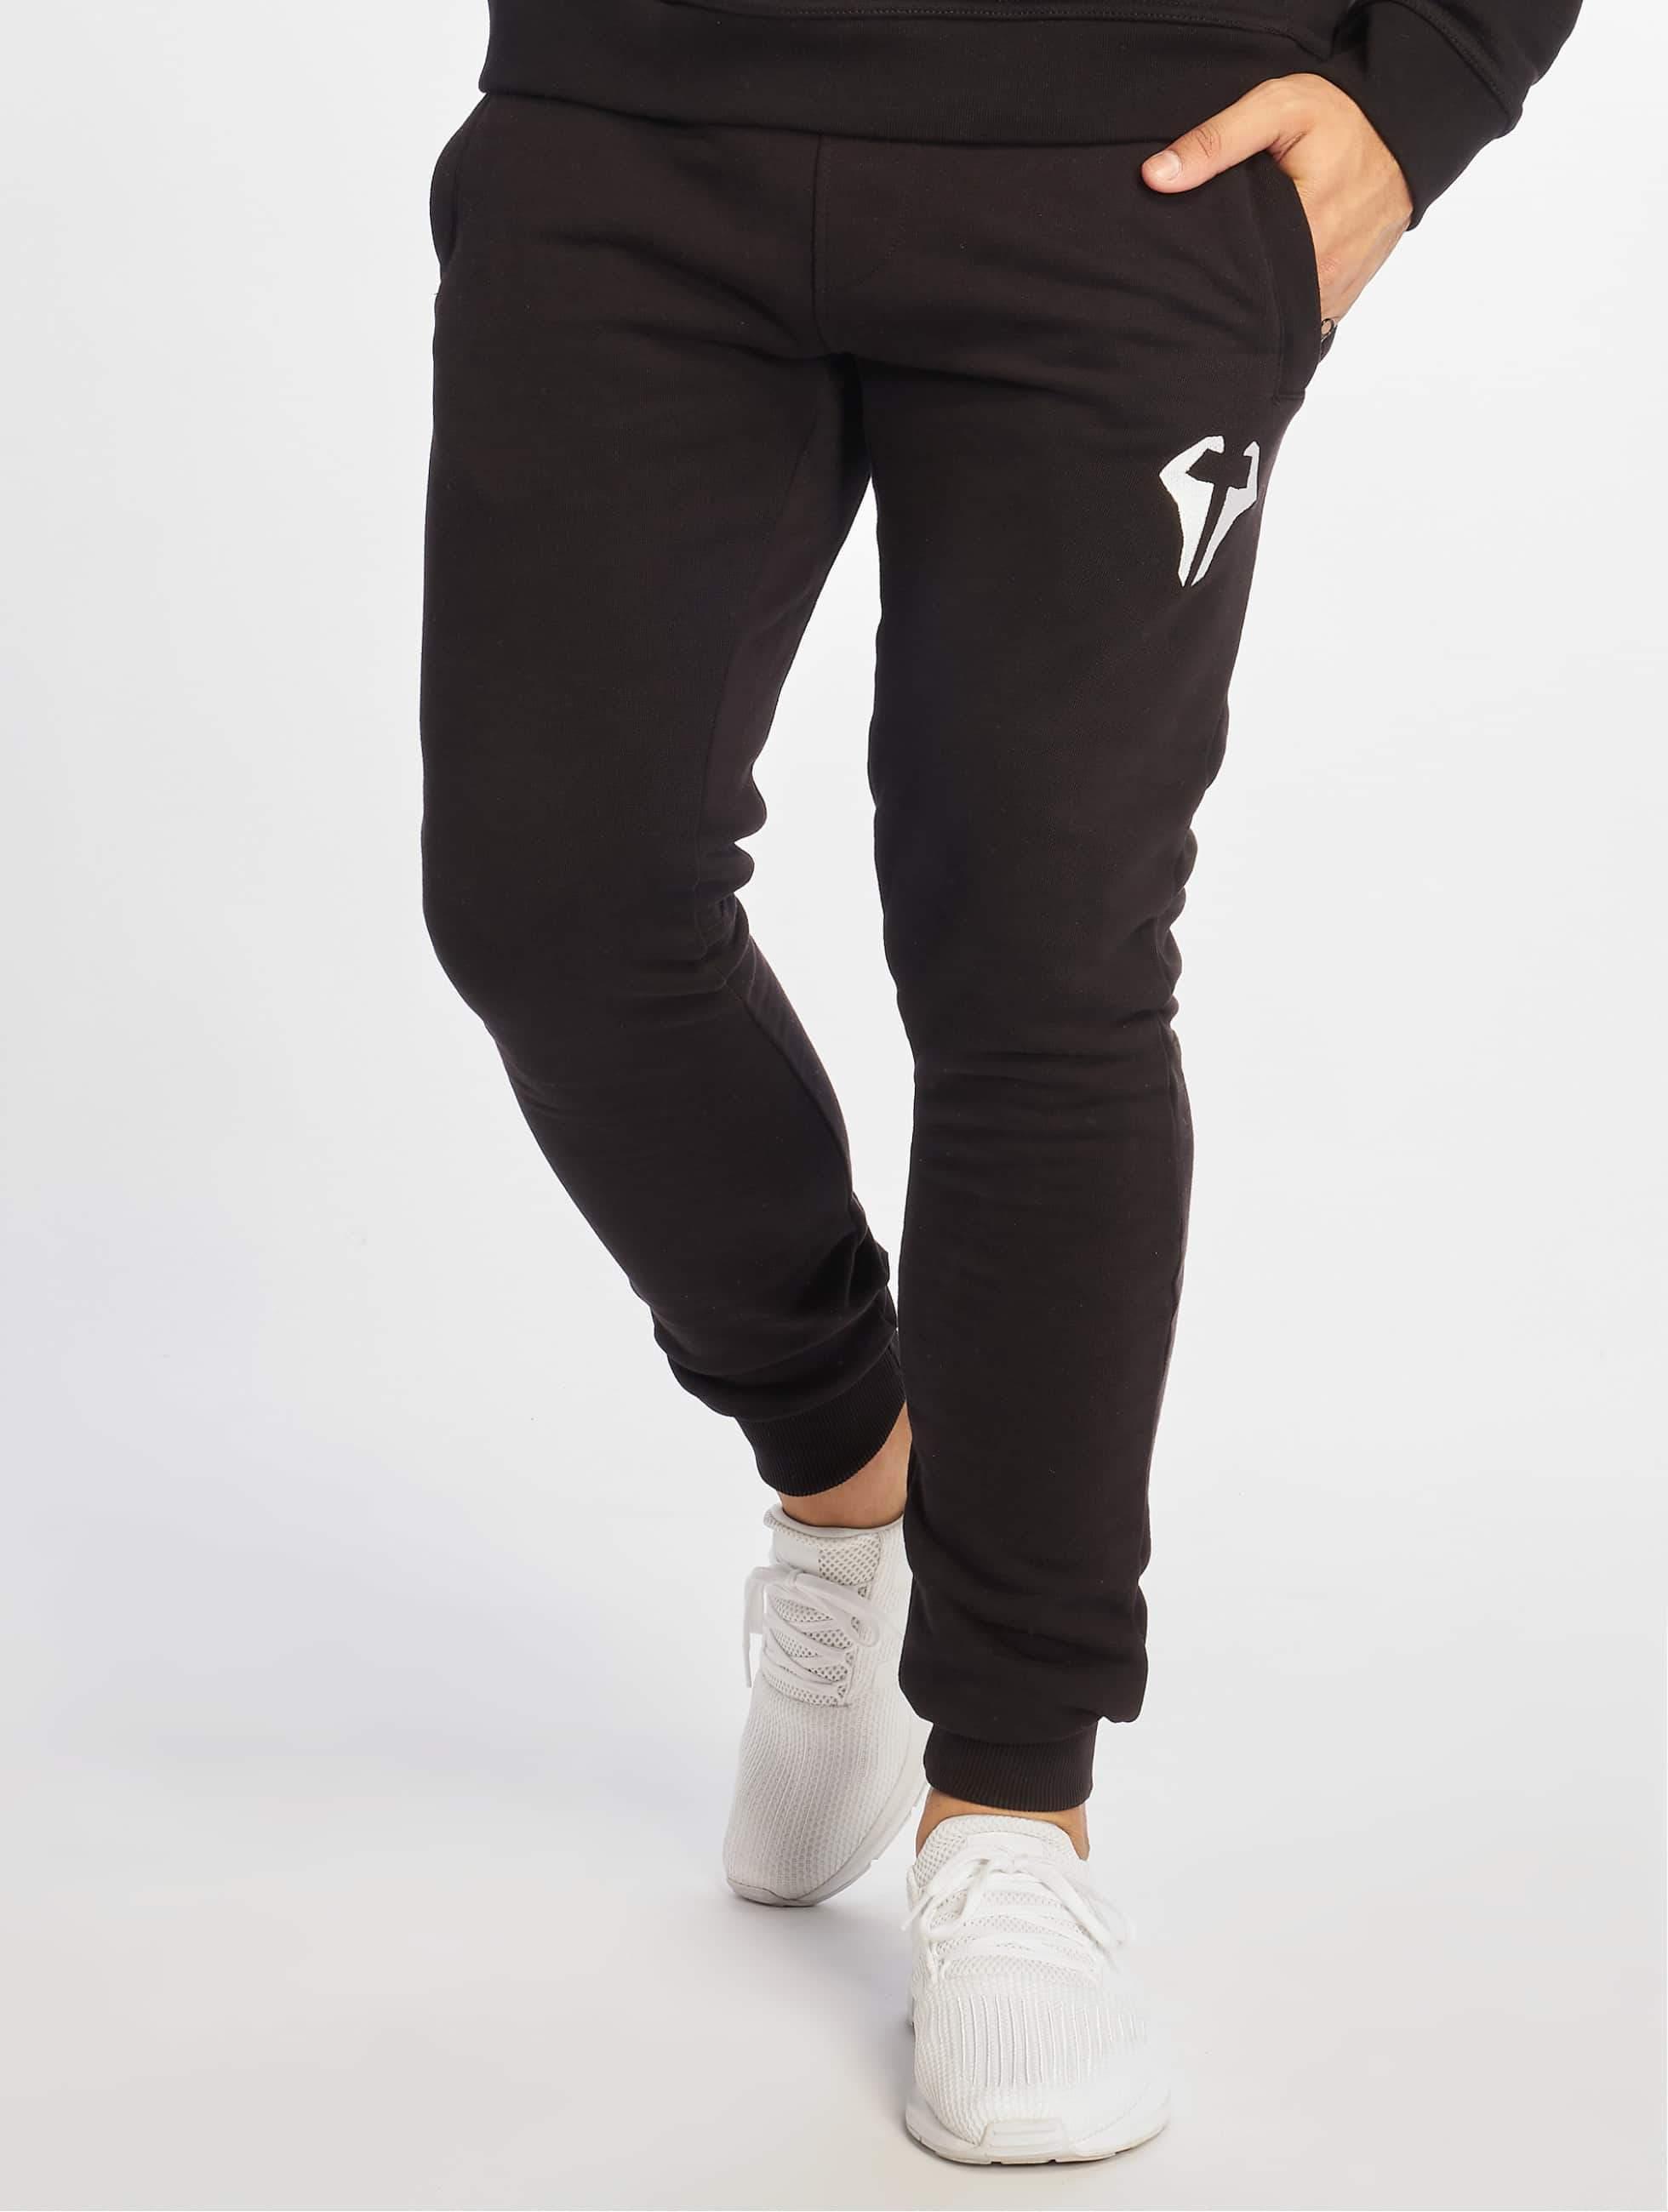 DEF / Sweat Pant beUNIQUE in black 2XL